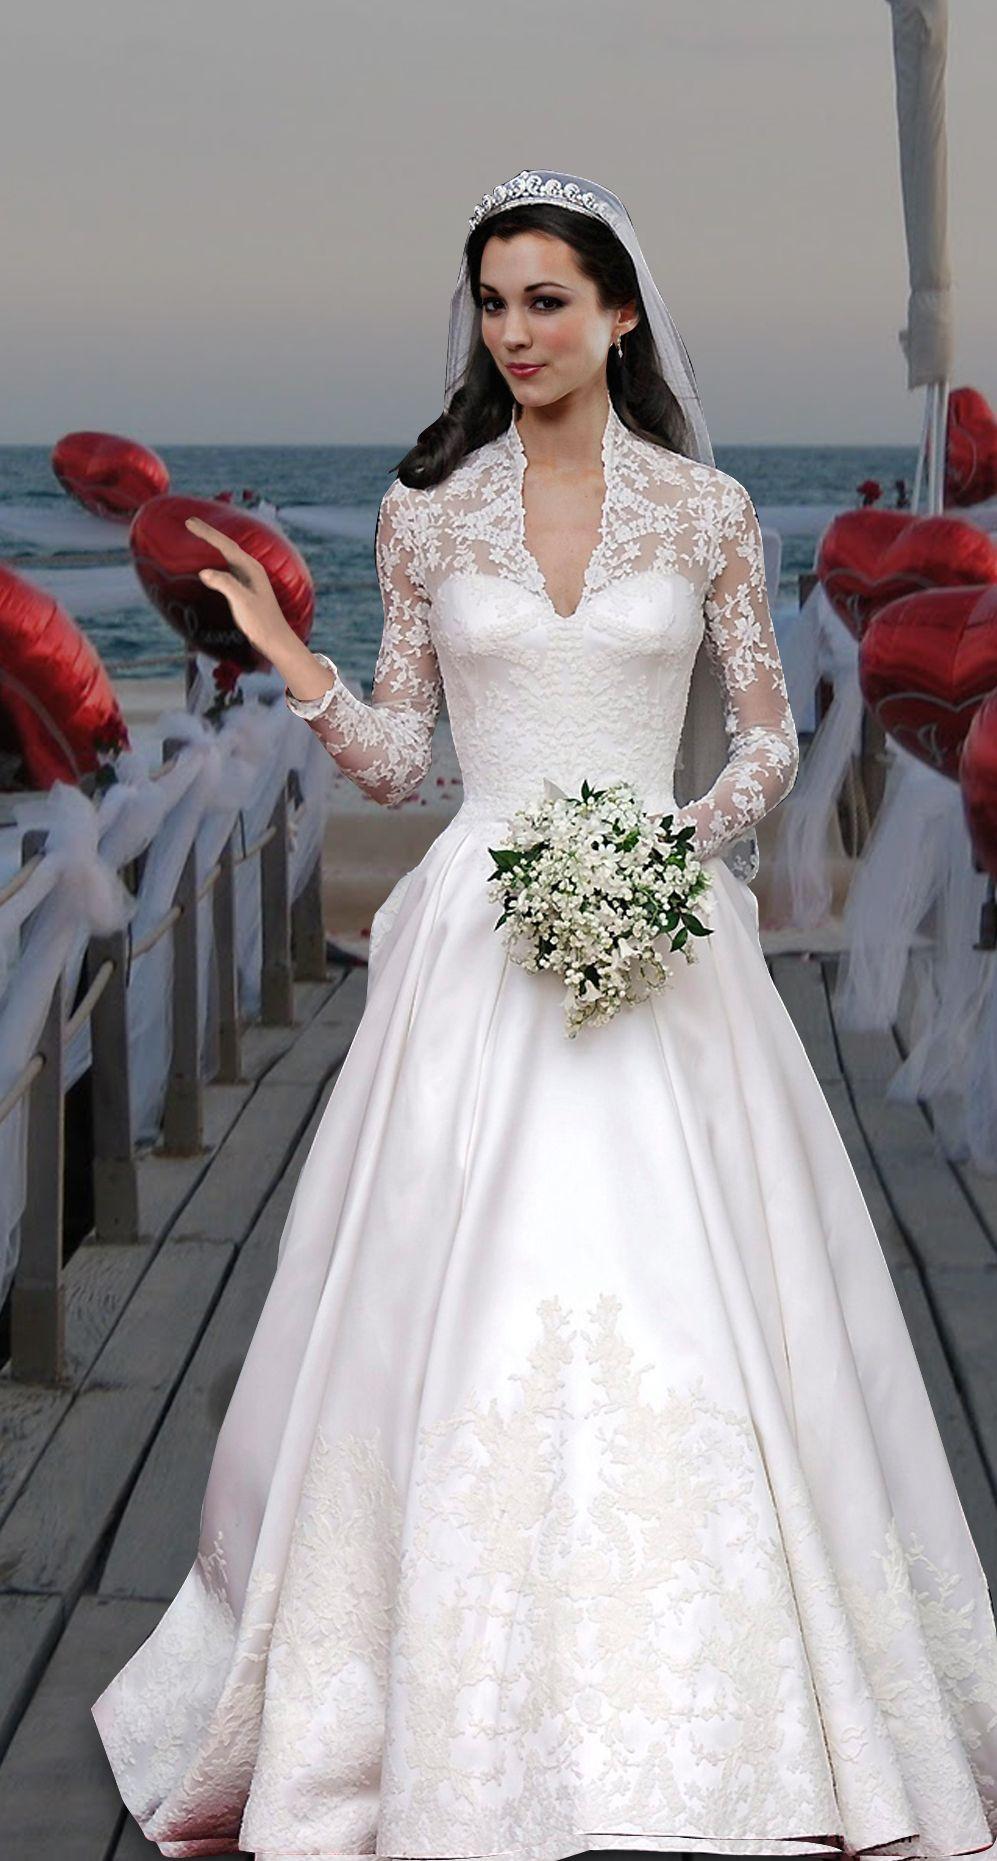 Kate Middleton S Wedding Dress Designed By Sarah Burton Of